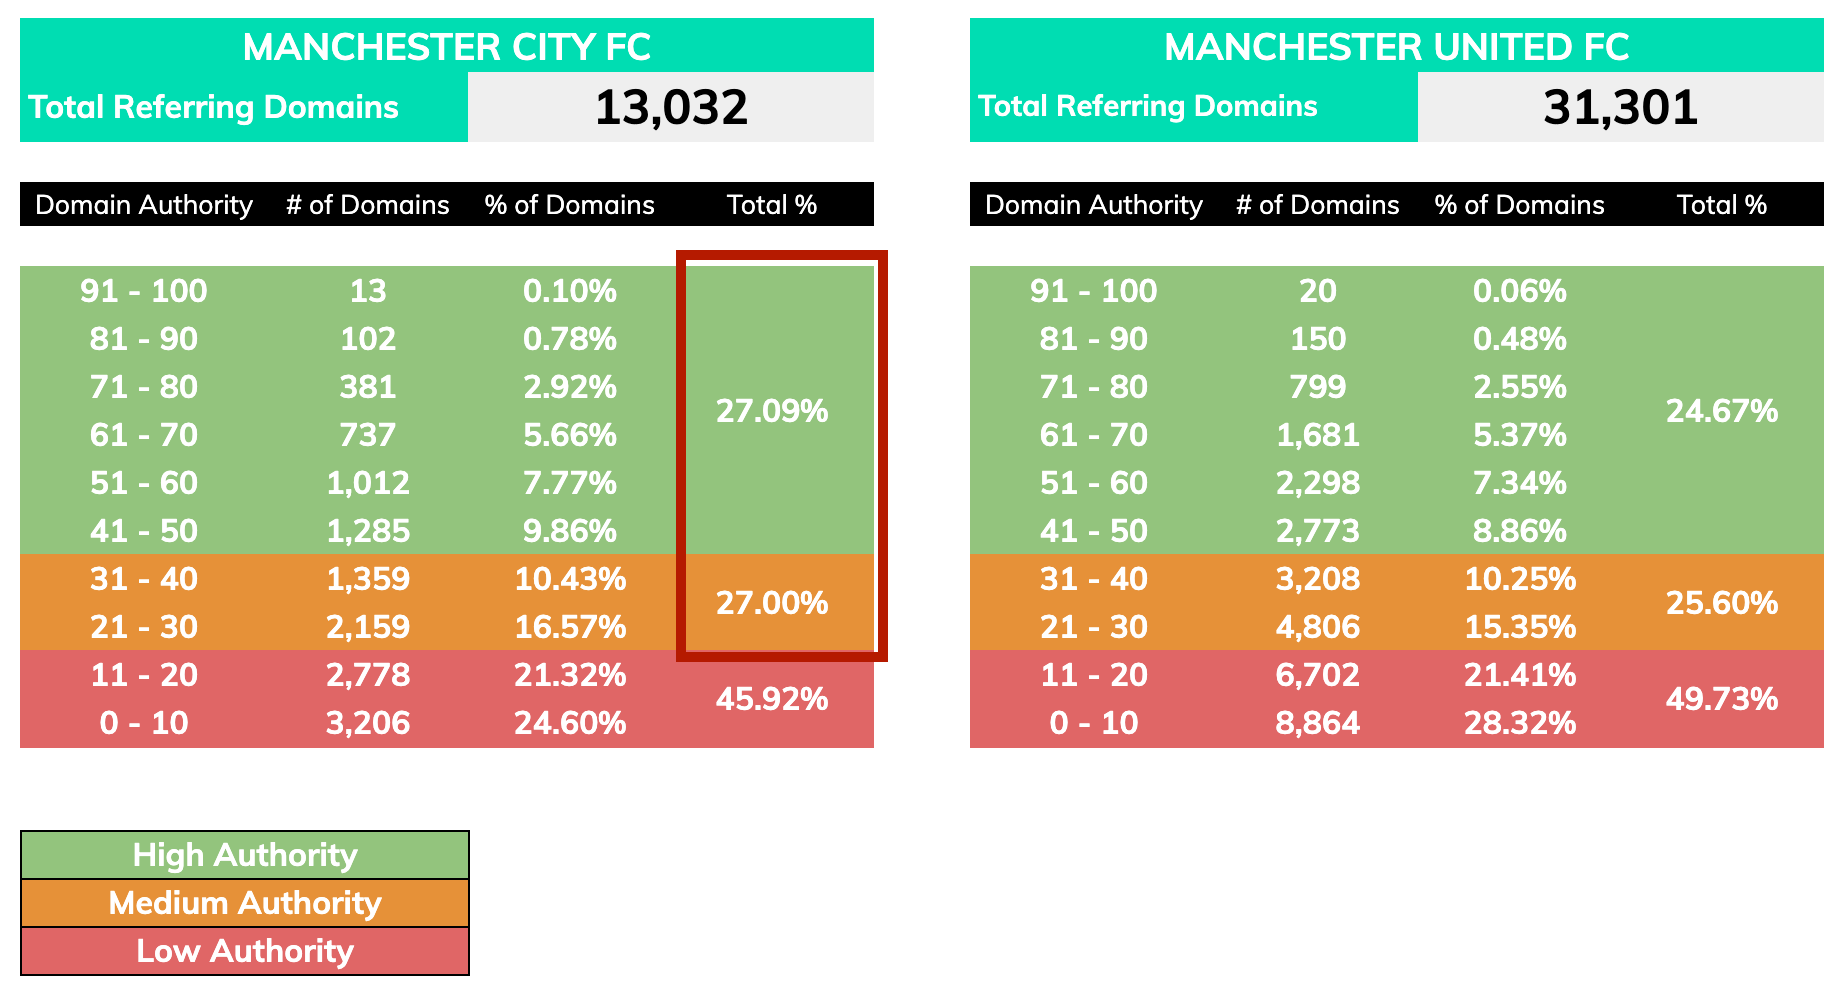 Seo competitor analysis man u vs man city 23